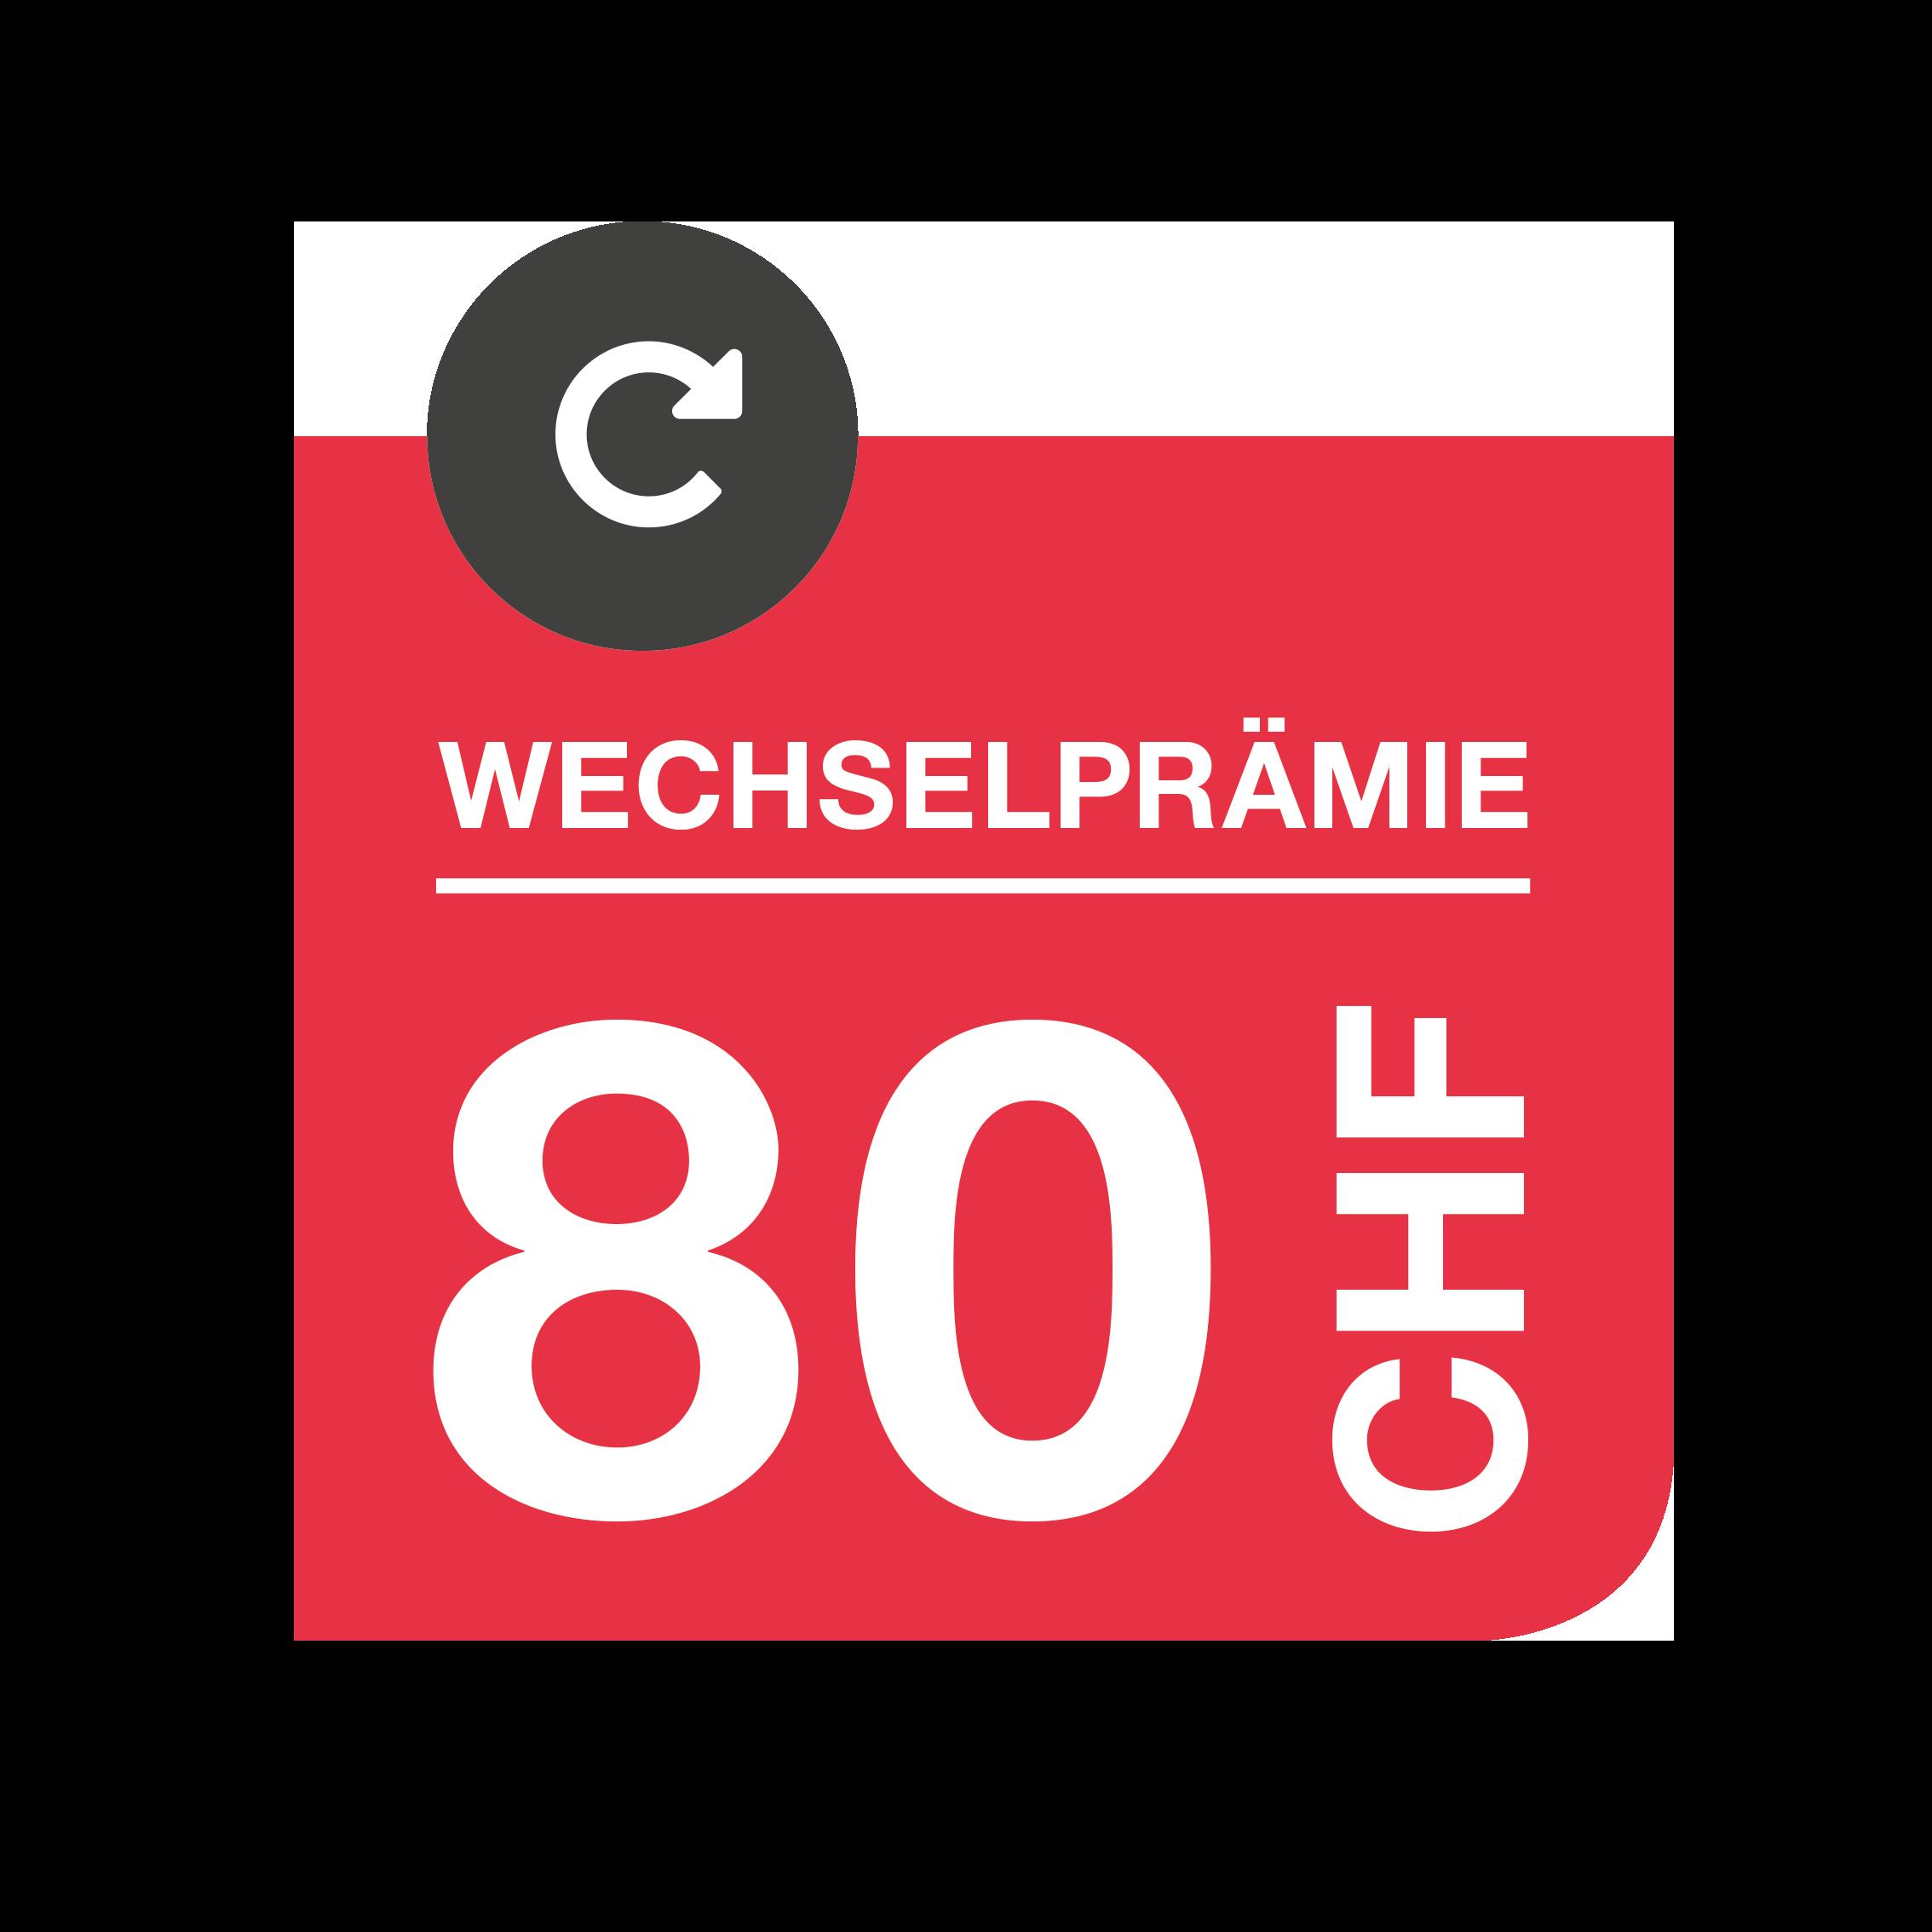 Wechselpraemie_80CHF_DE